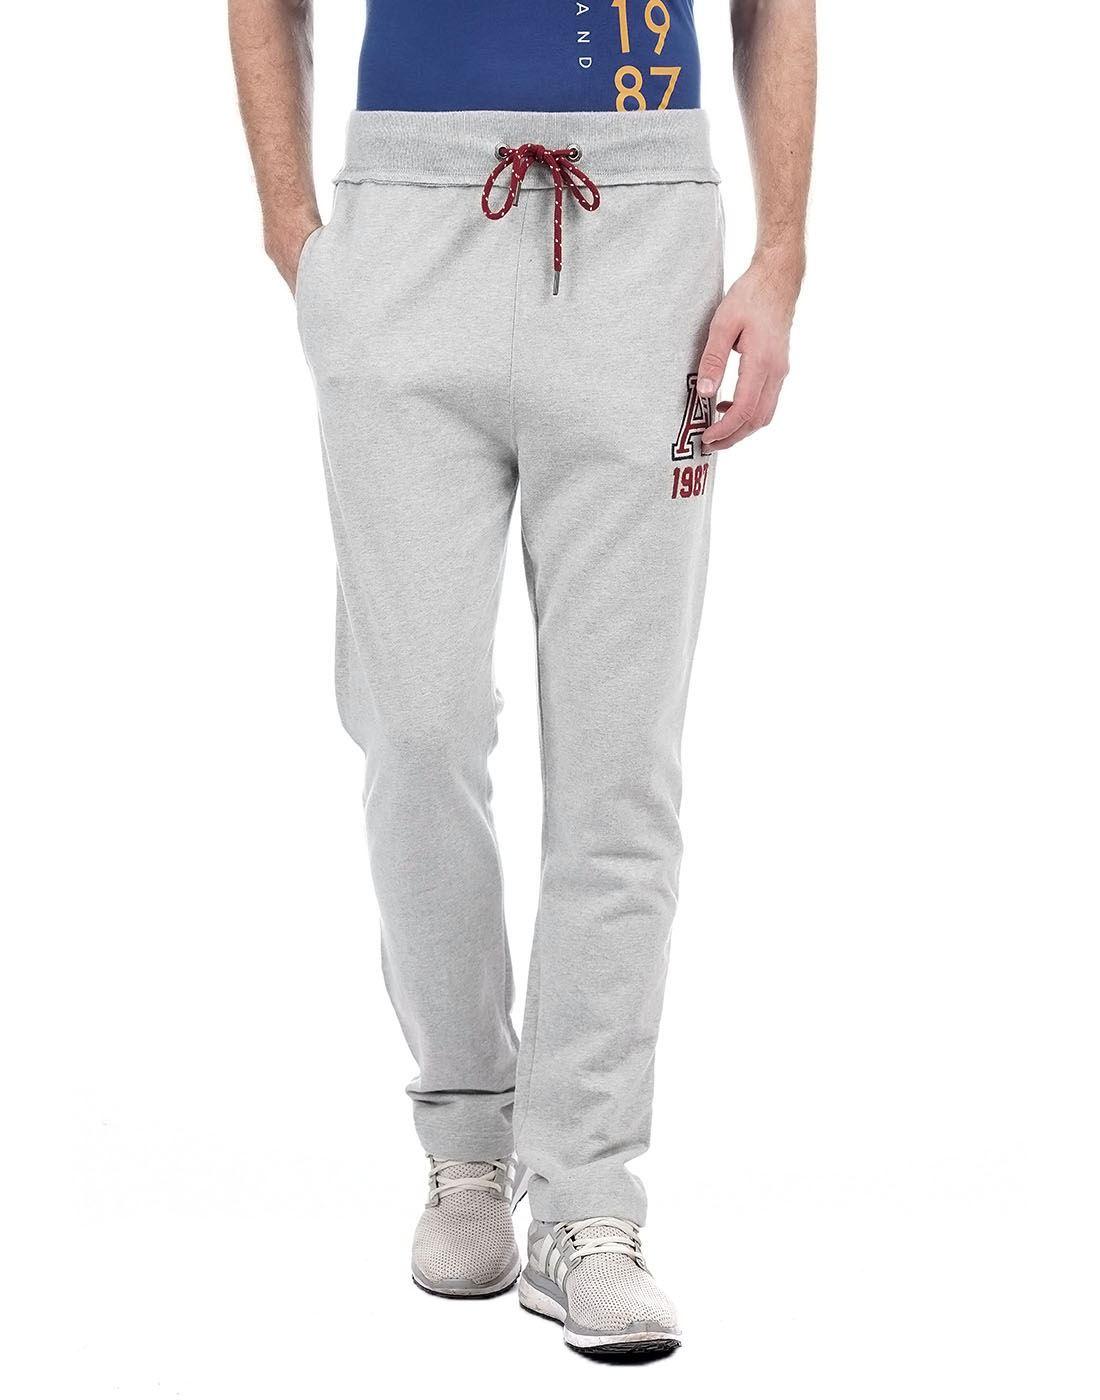 Aeropostale Men Grey Track Pant